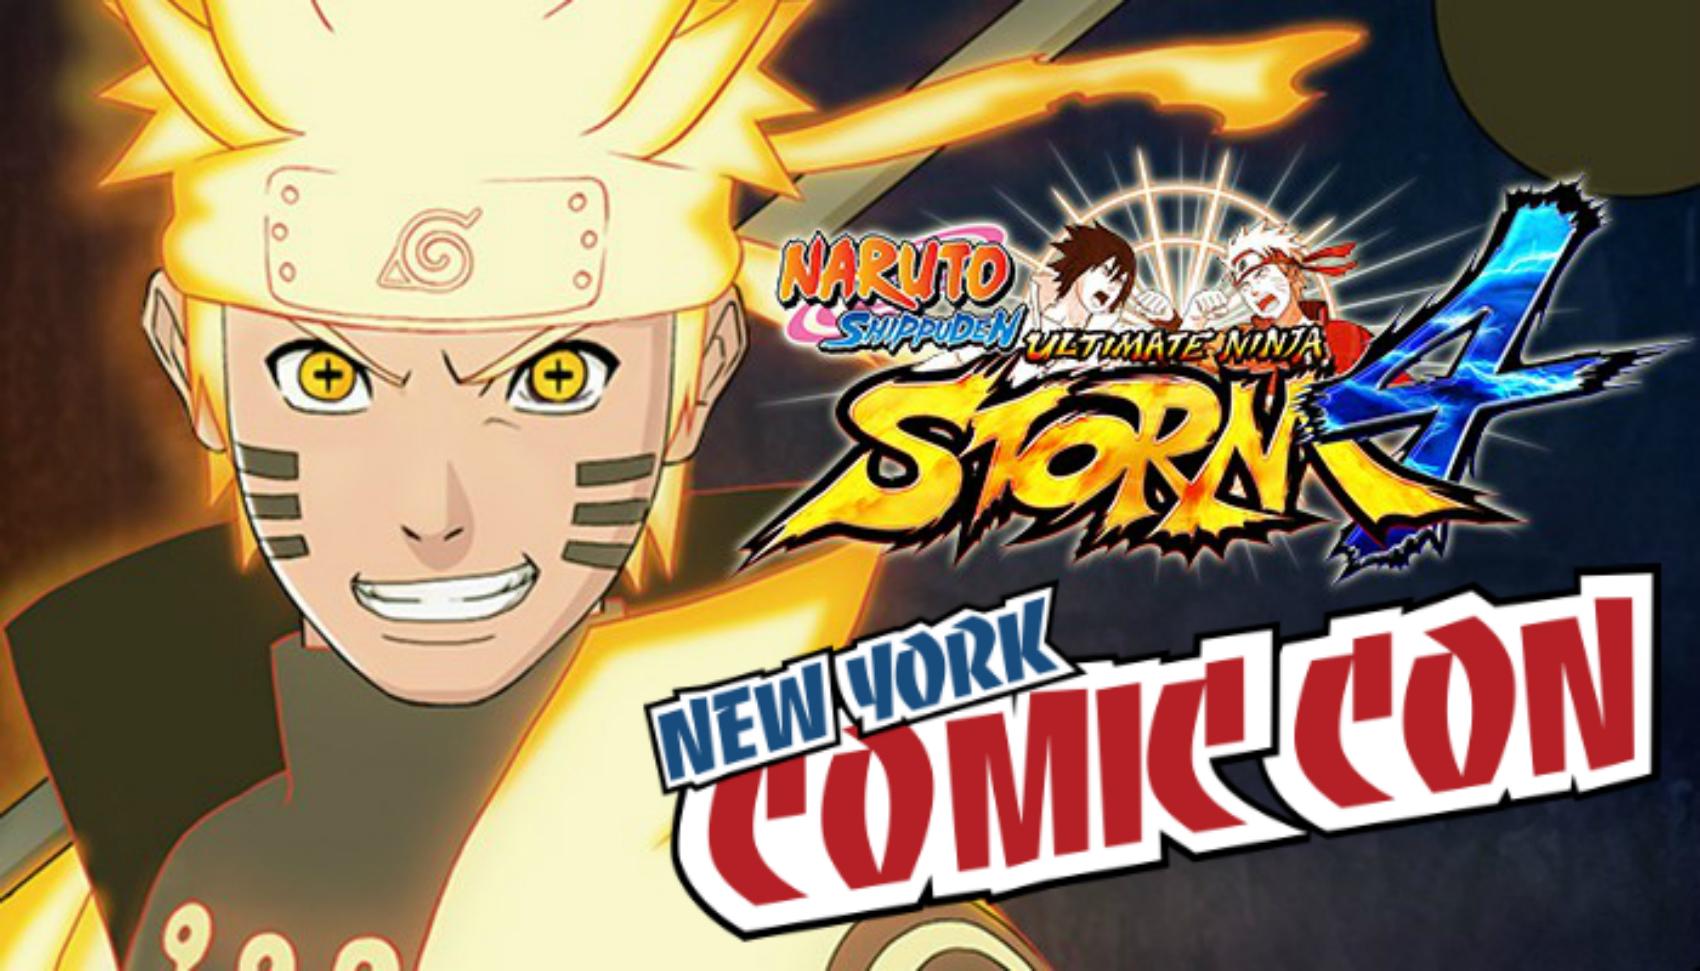 naruto-shippuen-ultimate-ninja-storm-4-confirmado-pn-n_00012